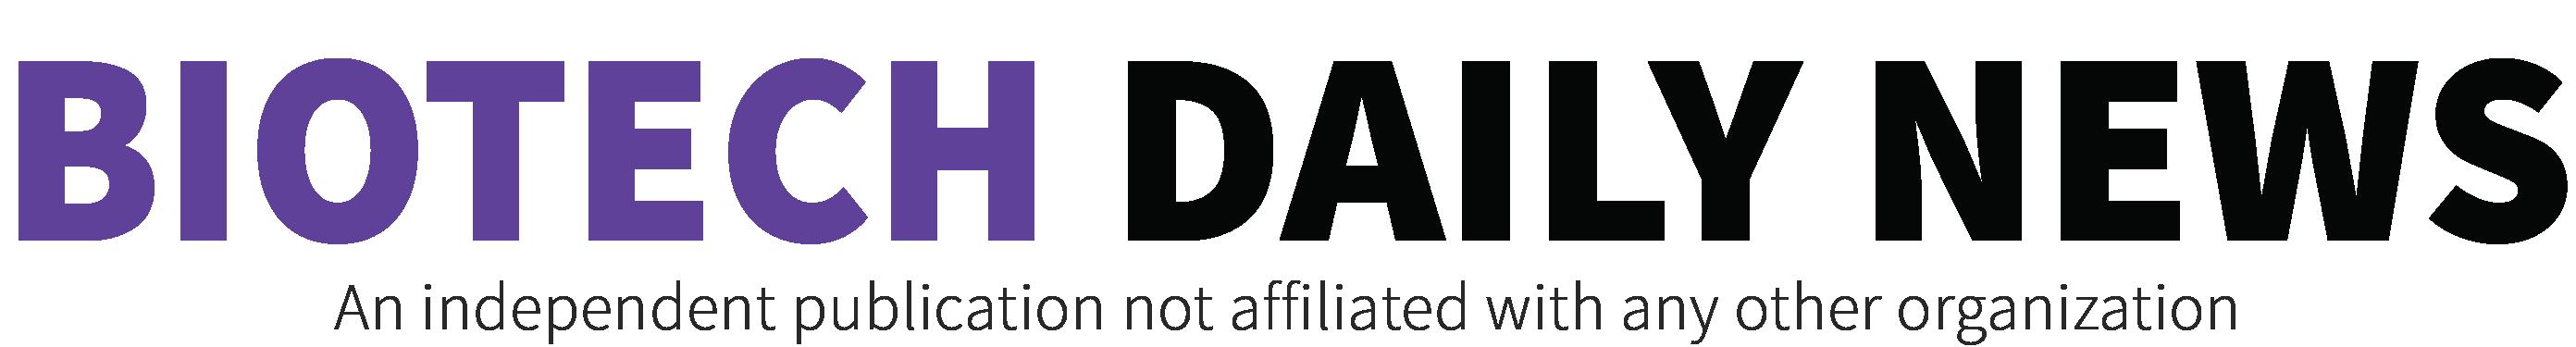 BioTech Daily news logo